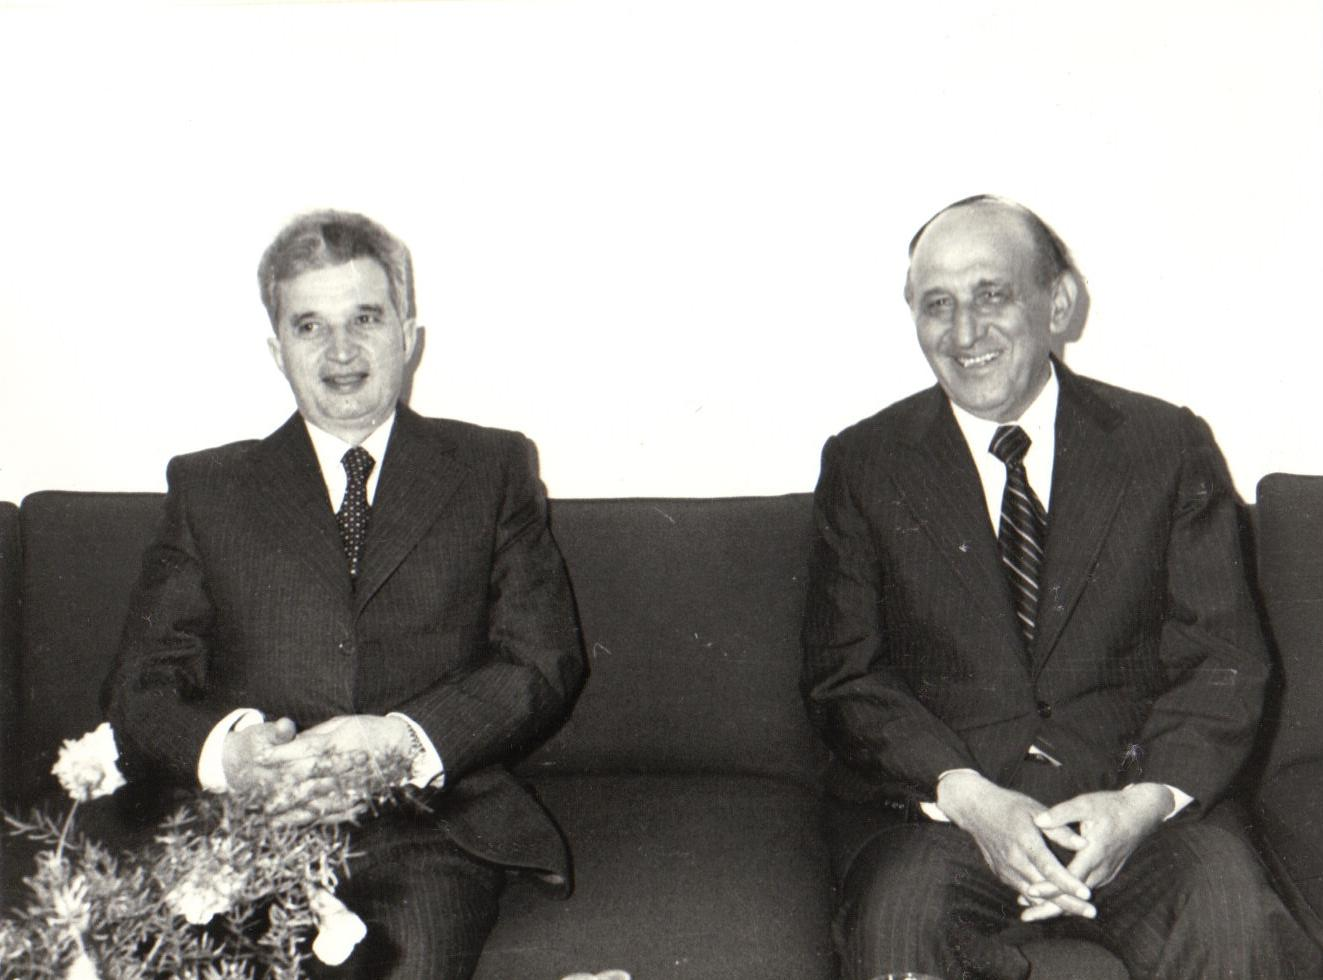 Todor Zhivkov Bulgaria with Caucescue